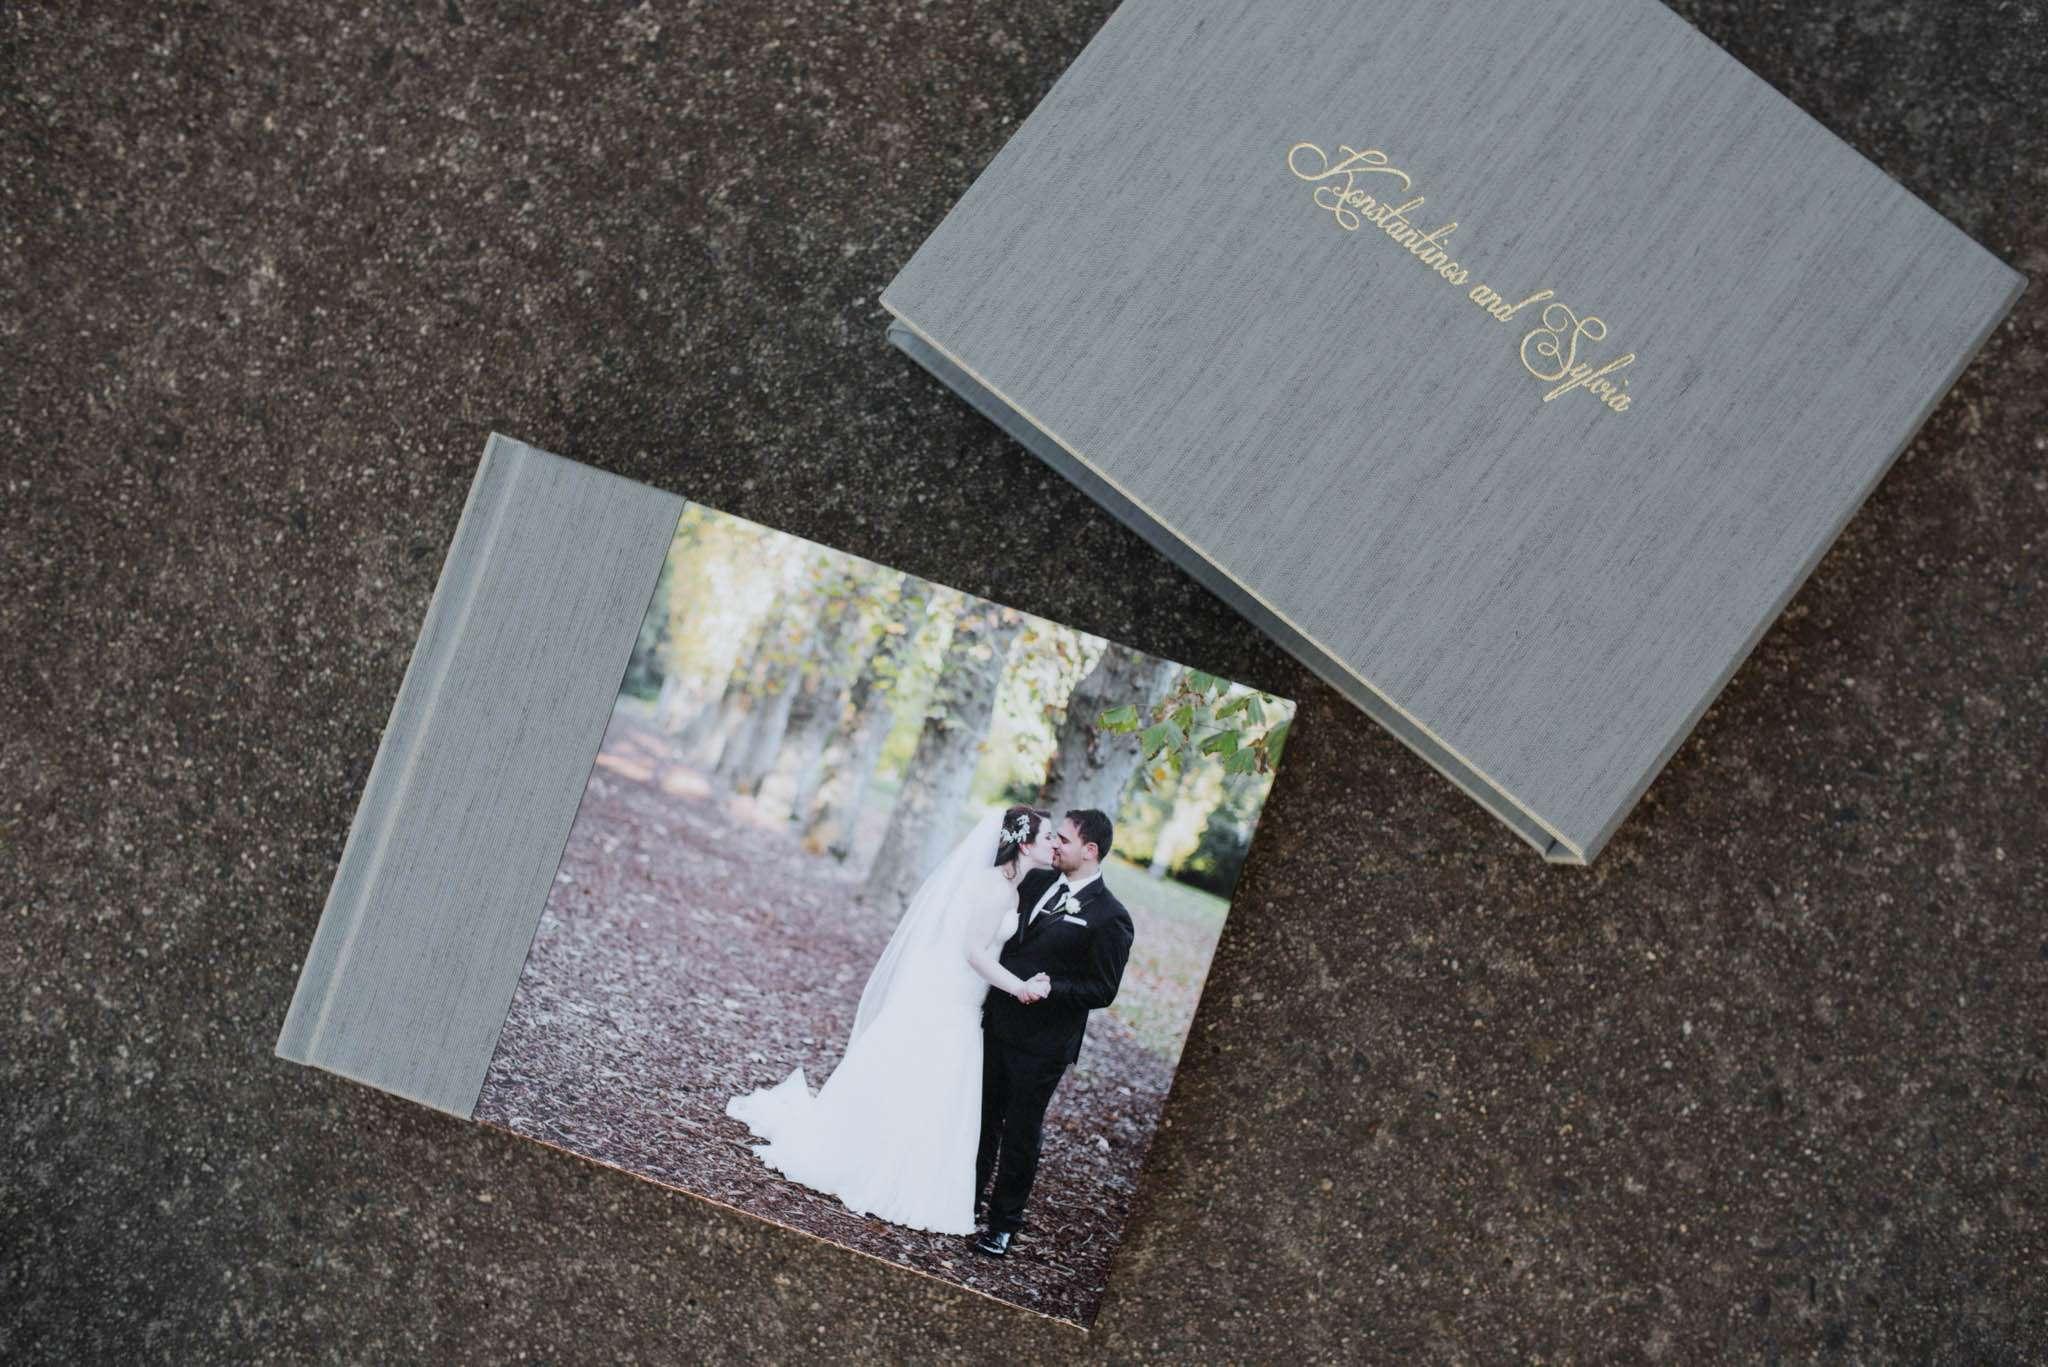 Wedding Albums with Photo Wrap Covers - Horizontal Album